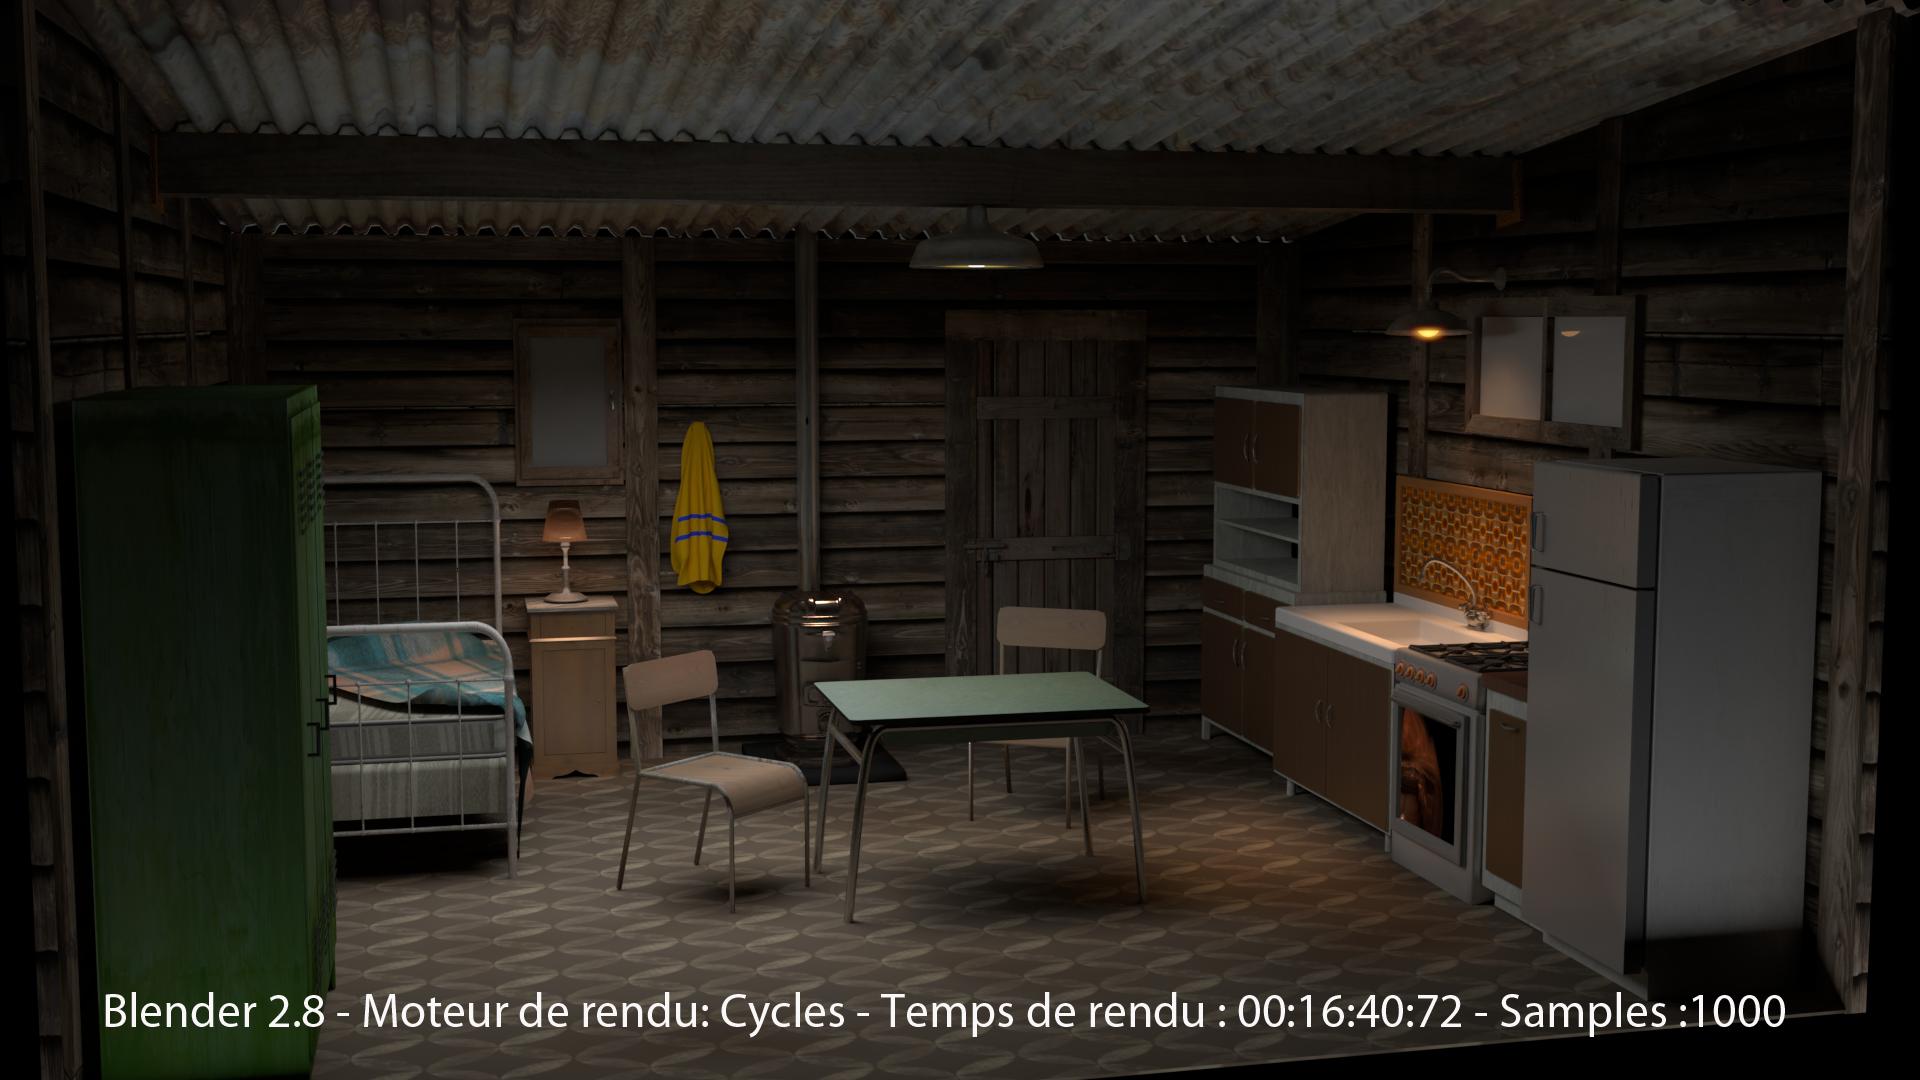 Blender2.8 image rendu sous Cycles